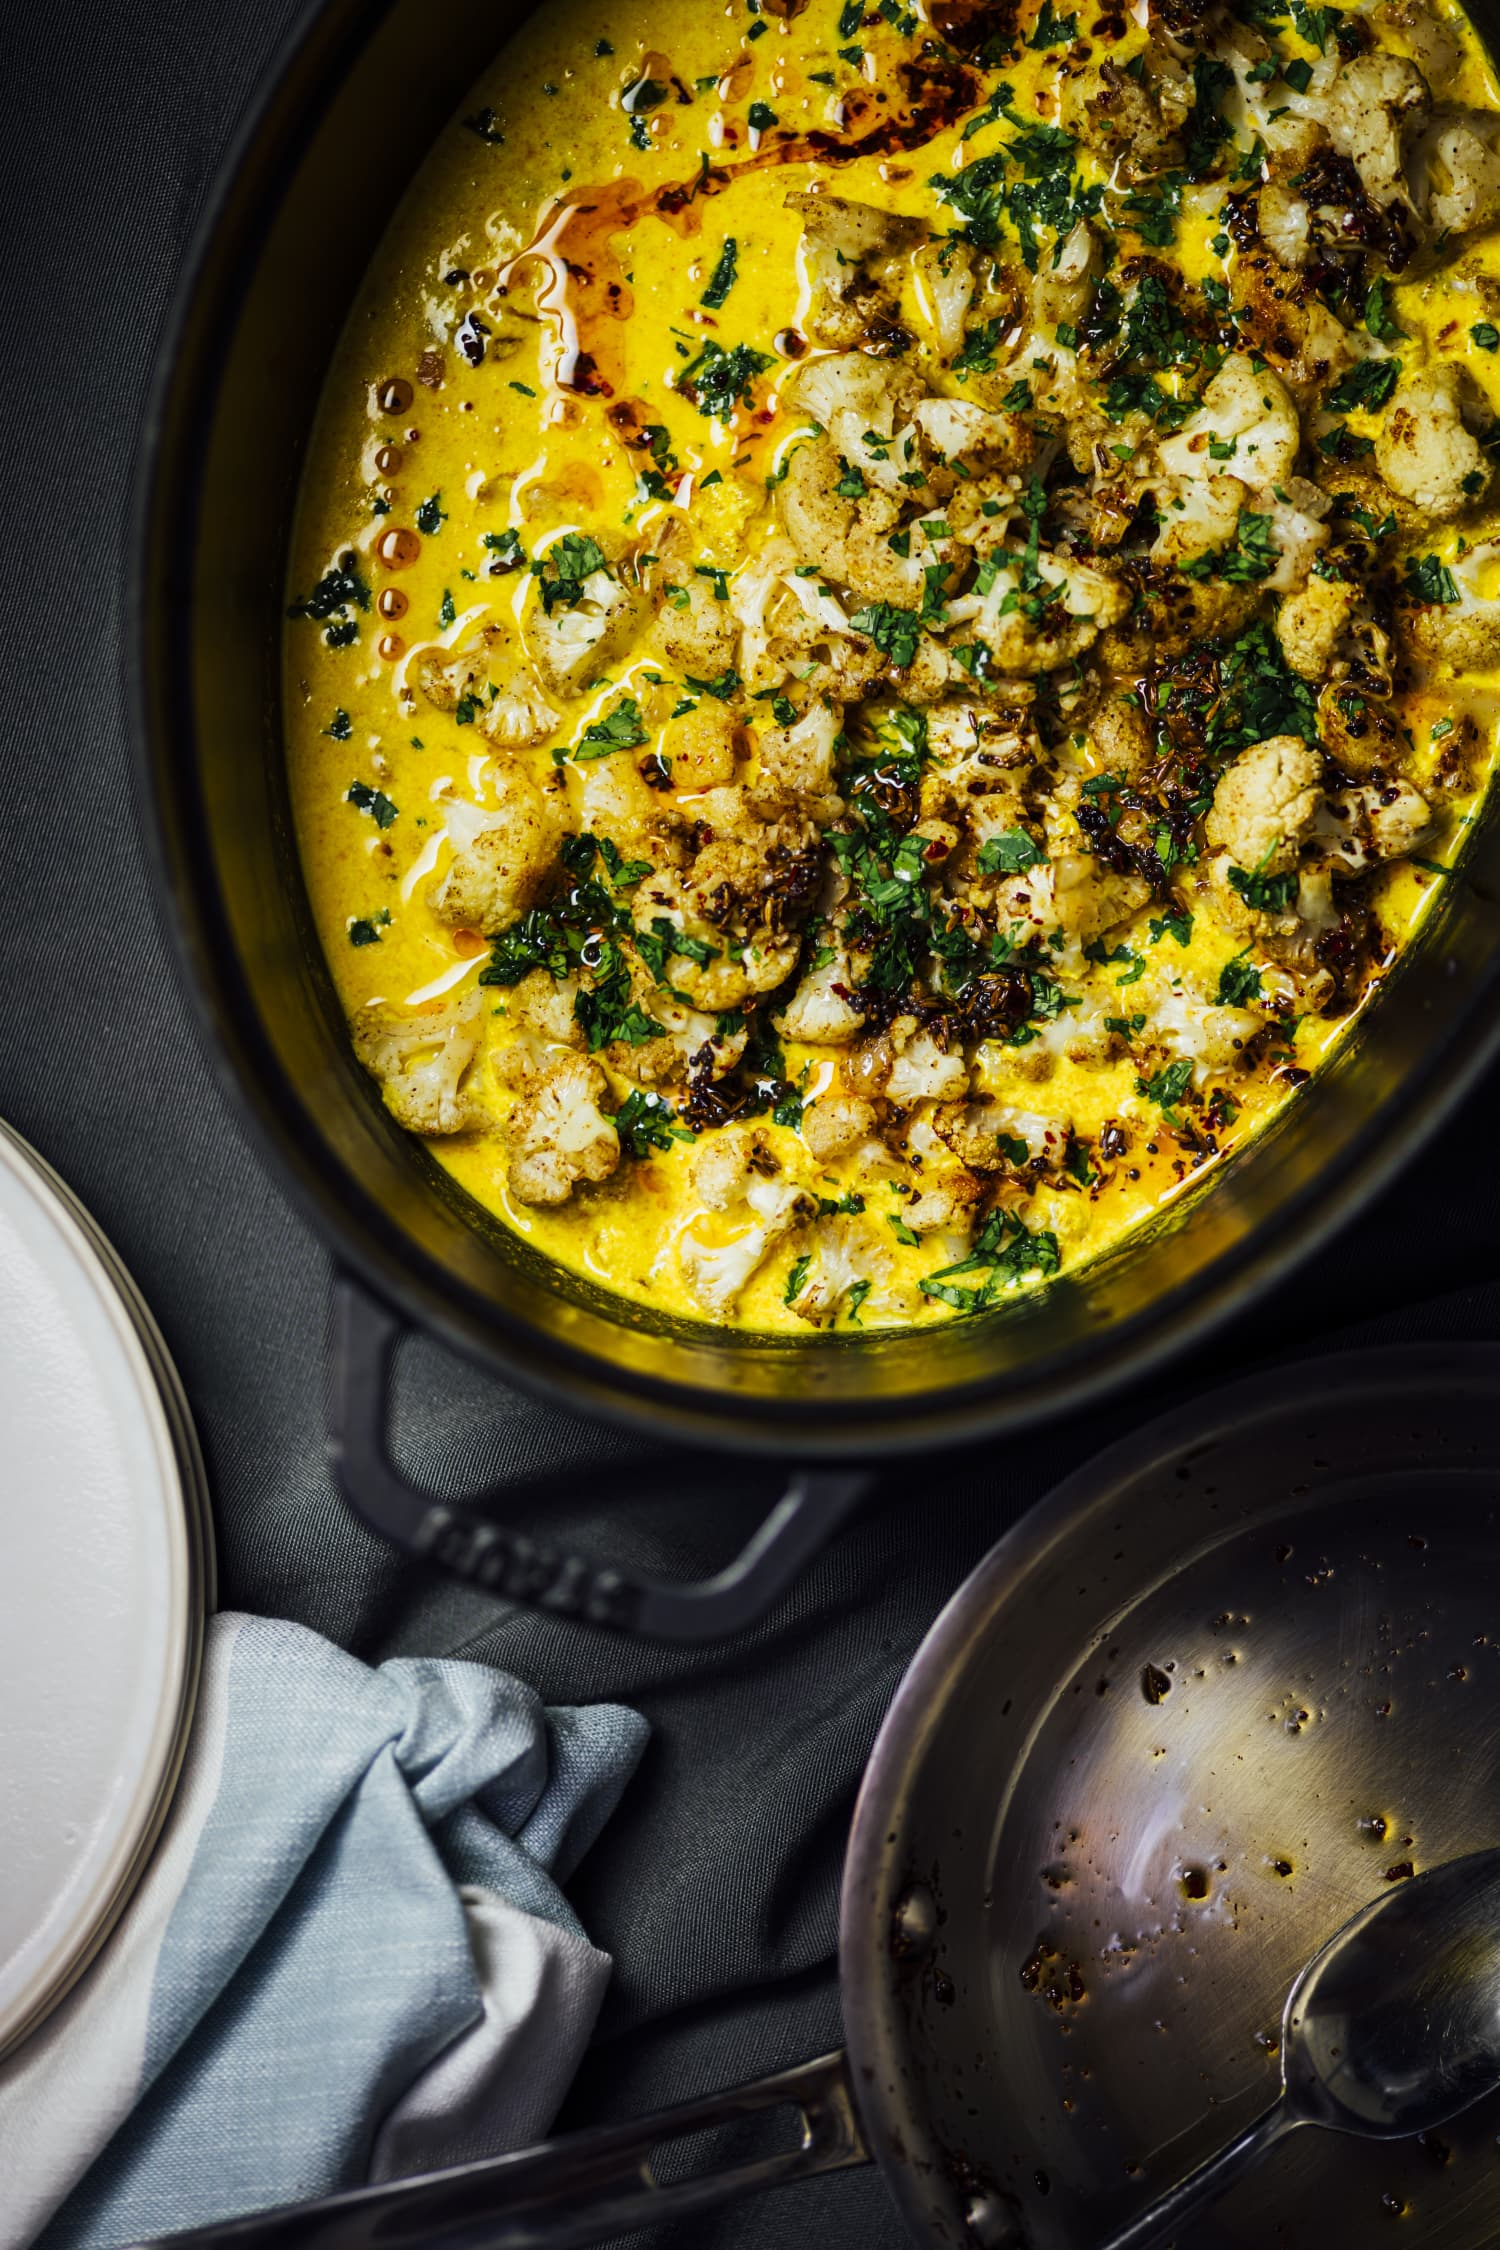 Nik Sharma's Roasted Cauliflower in Turmeric Kefir